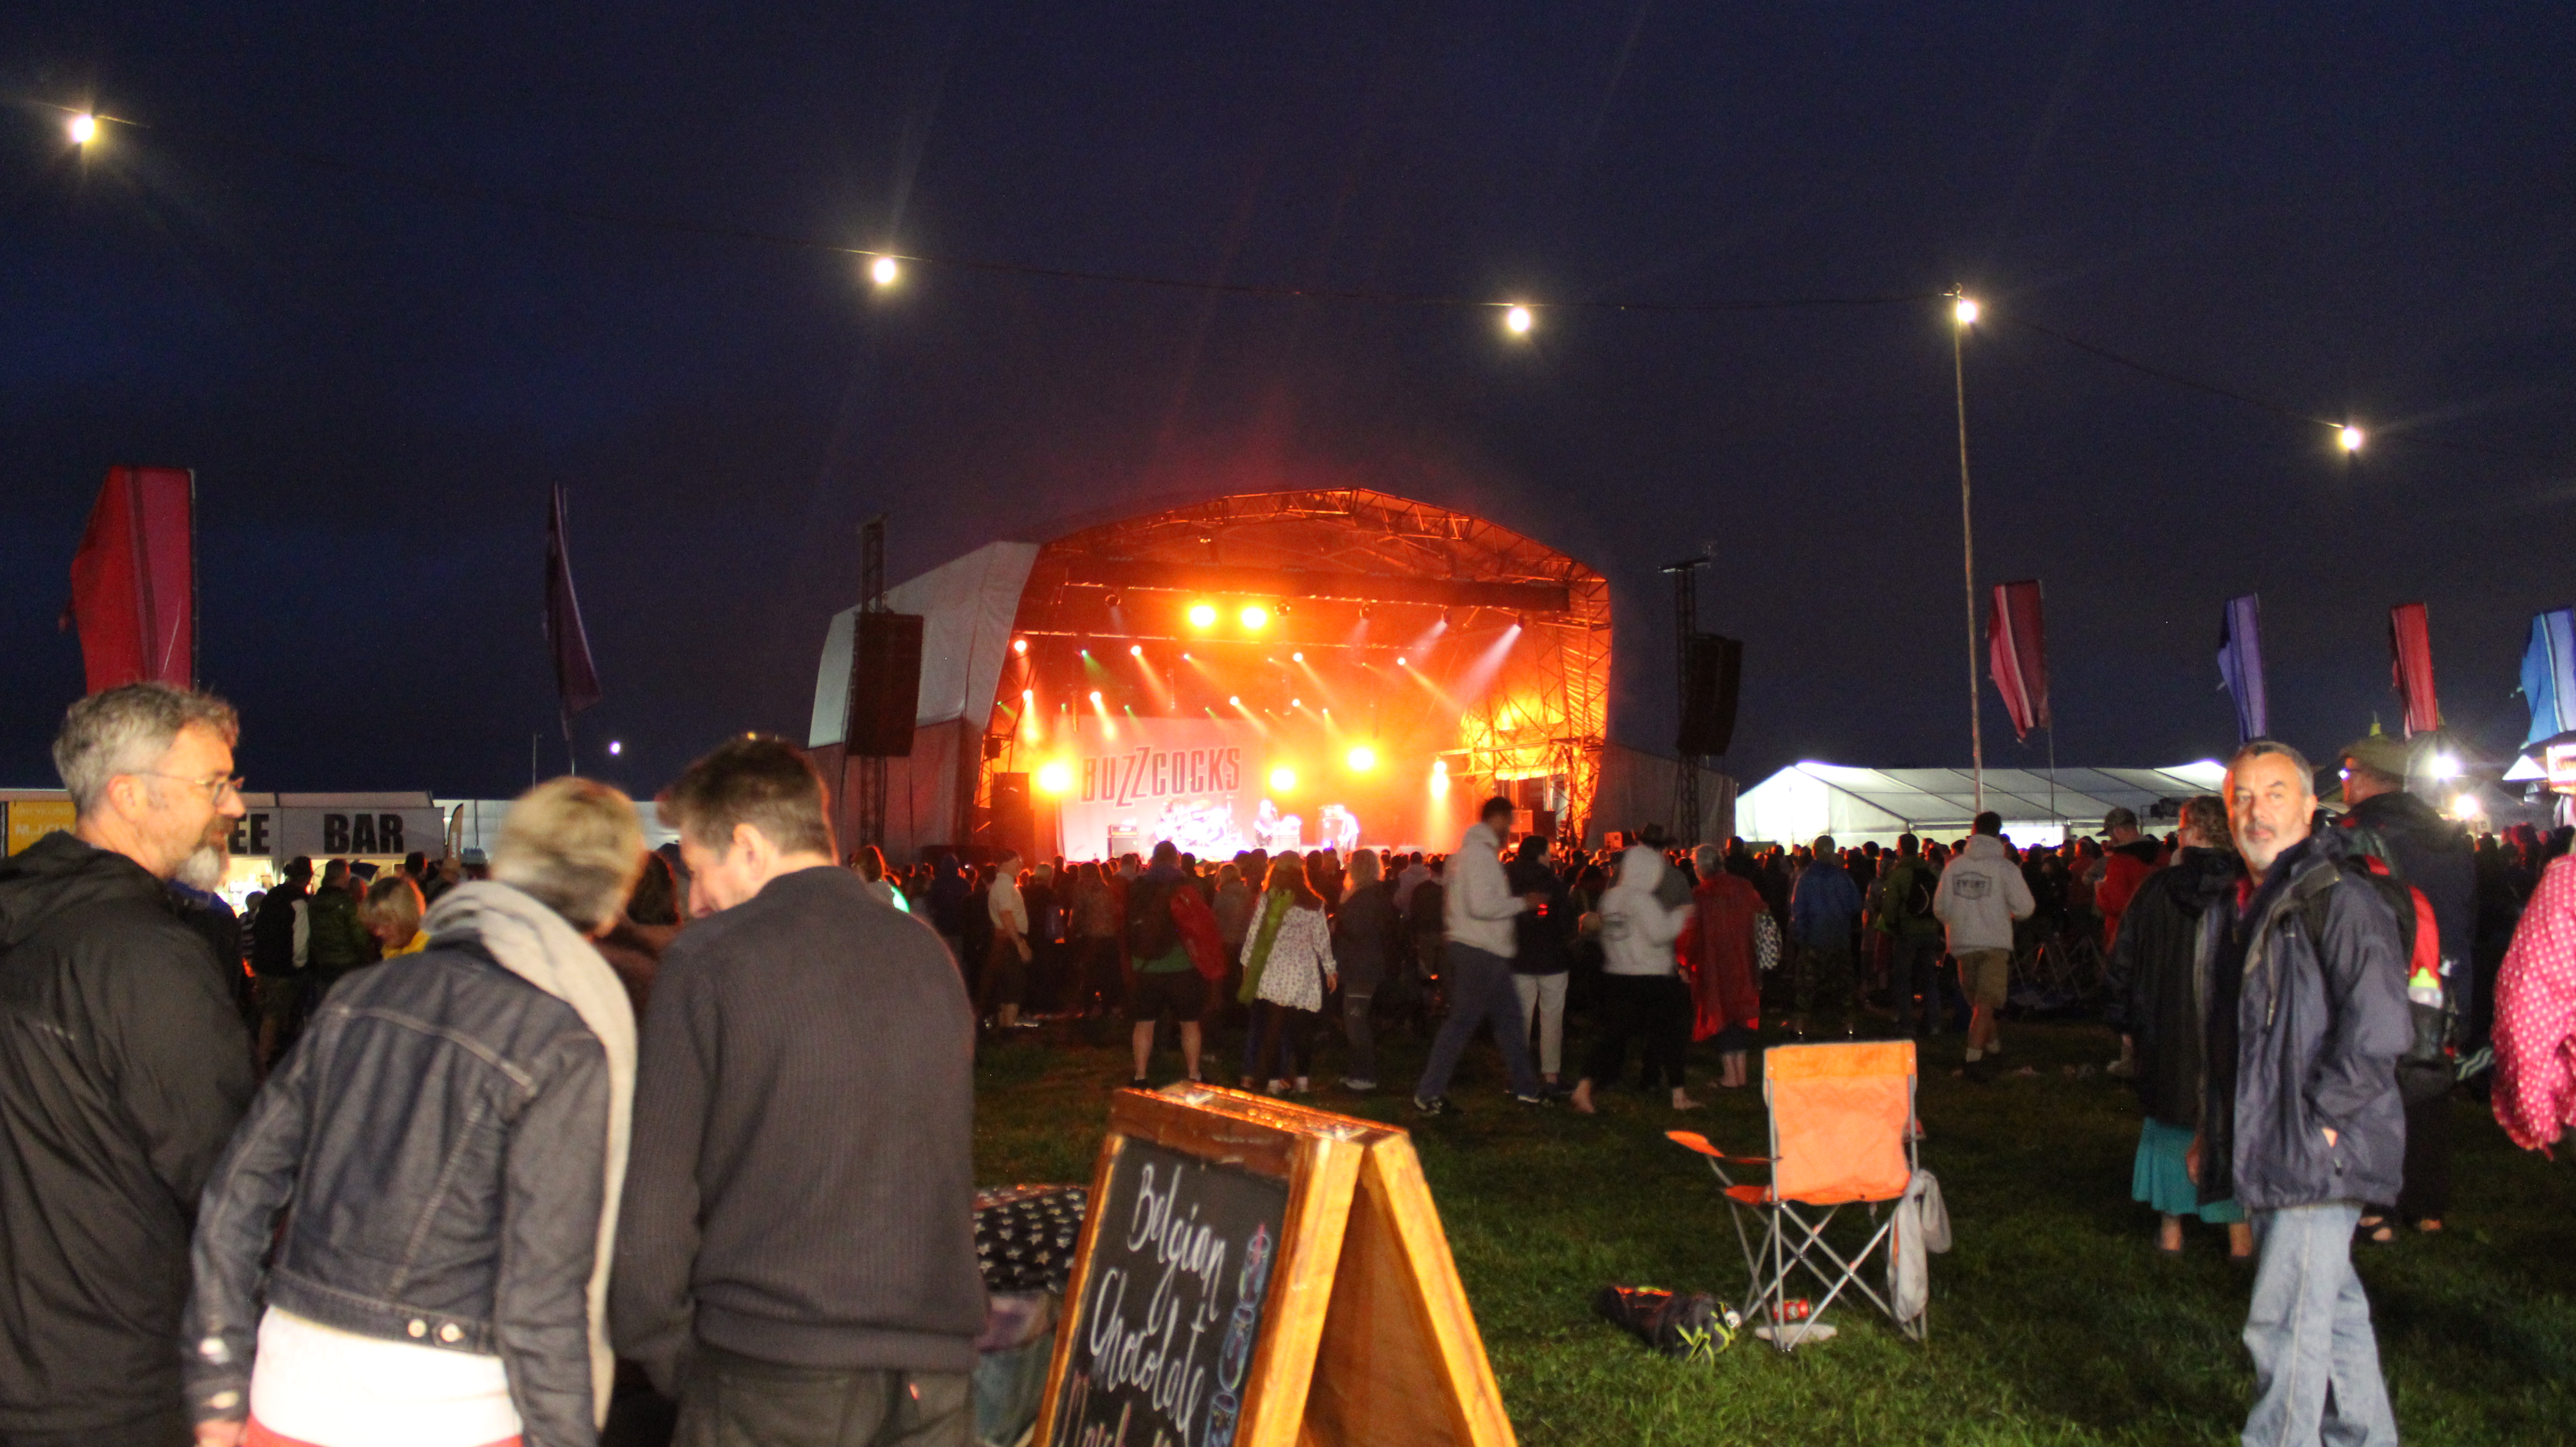 wychwood, wychwood 2017, family friendly festivals in the uk,